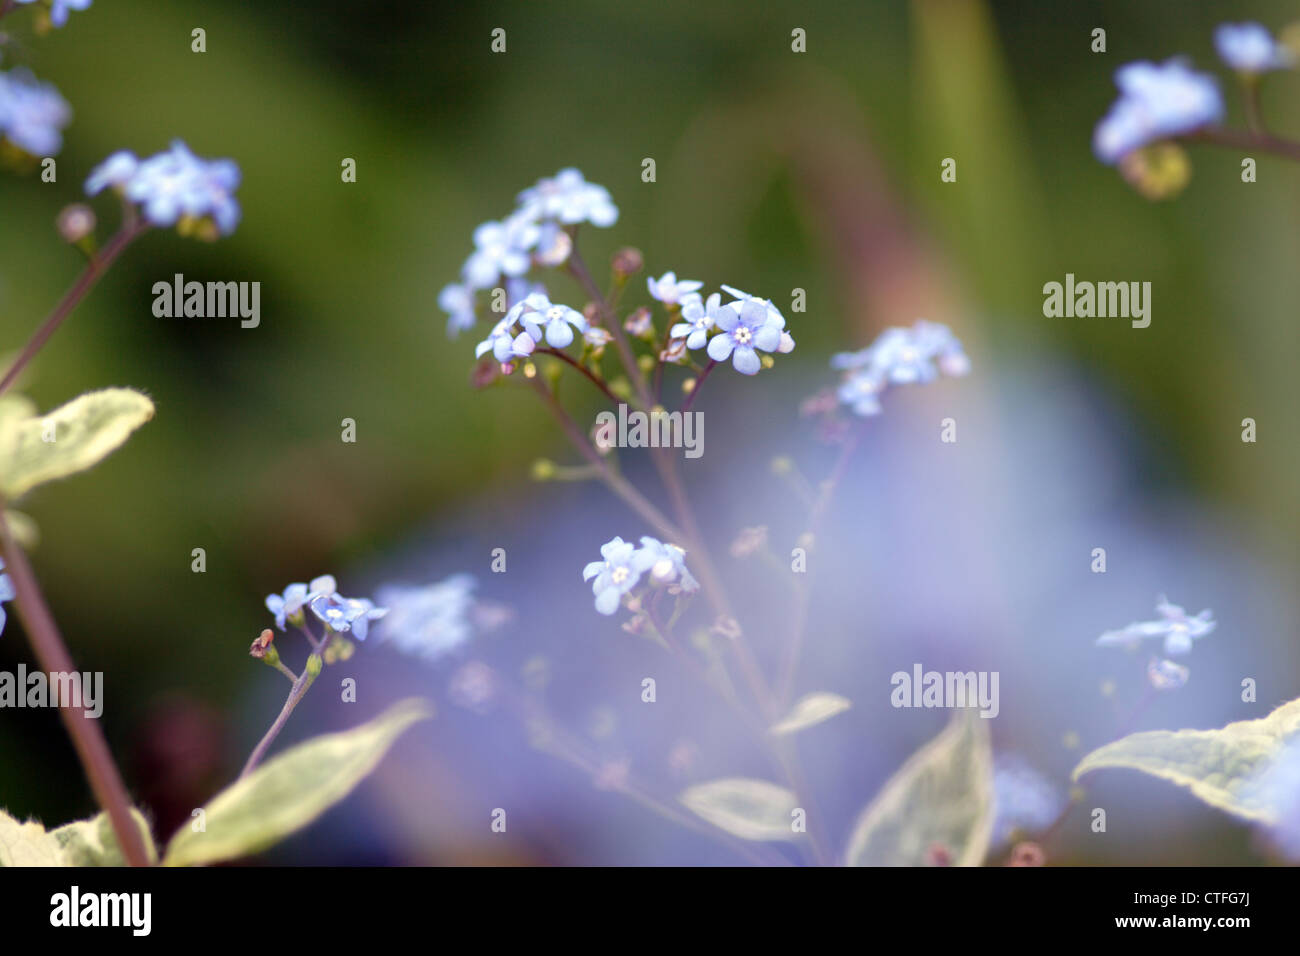 Wood Forget-me-not (Myosotis sylvatica) in flower, England, UK - Stock Image